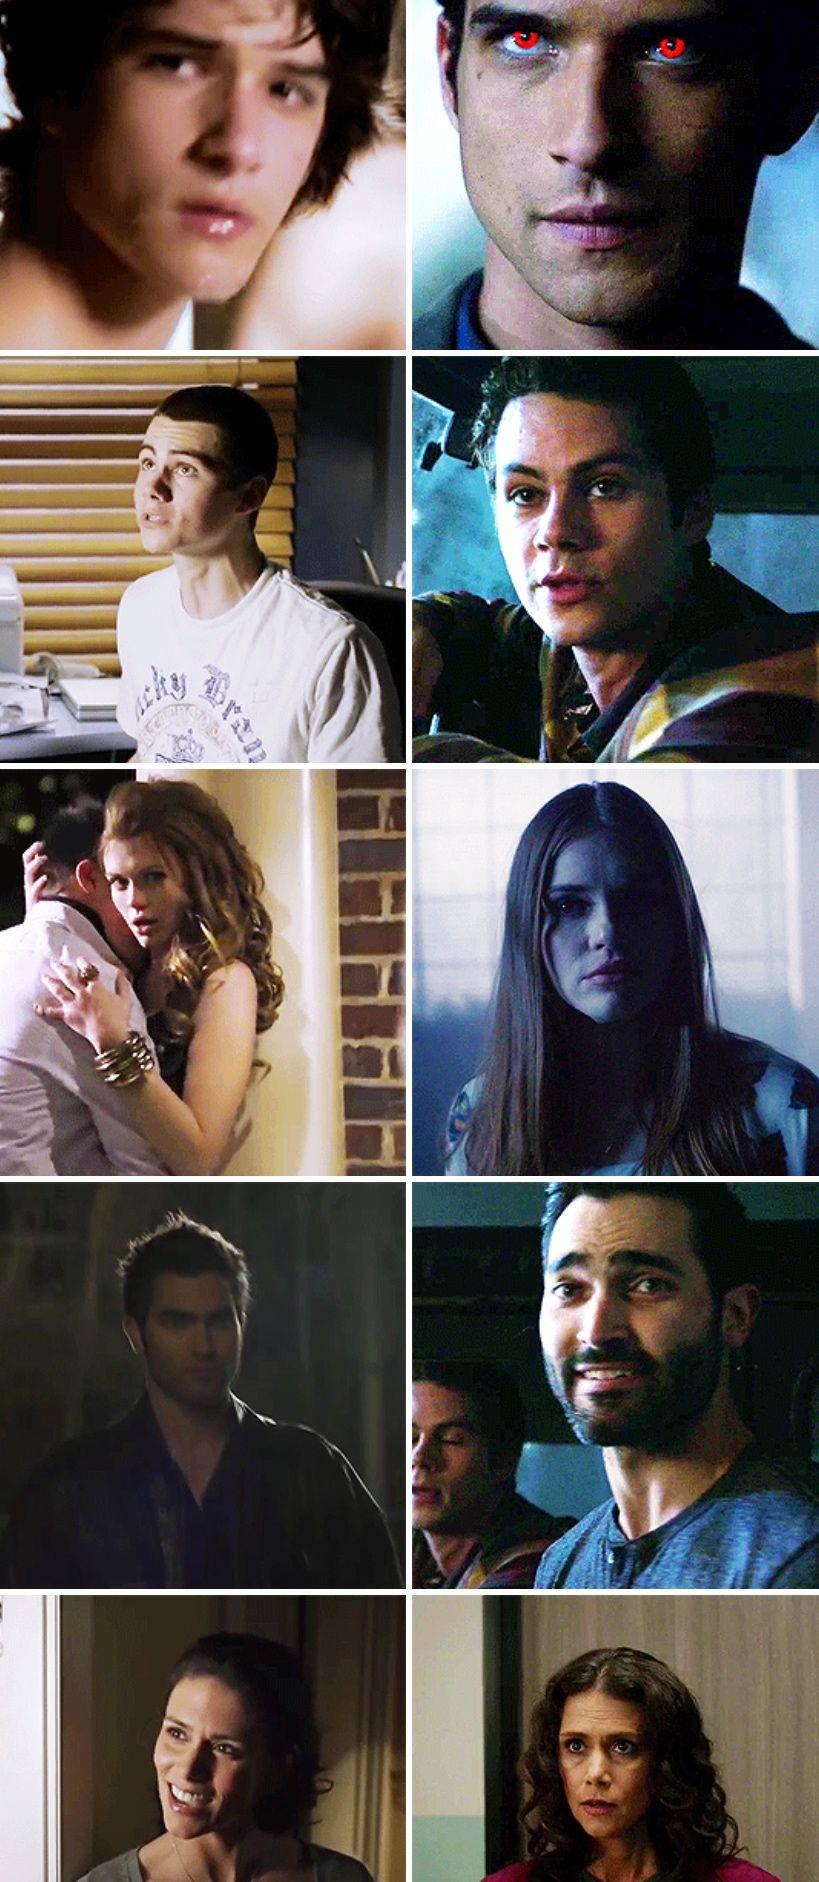 Teen Wolf - the first season and the last season